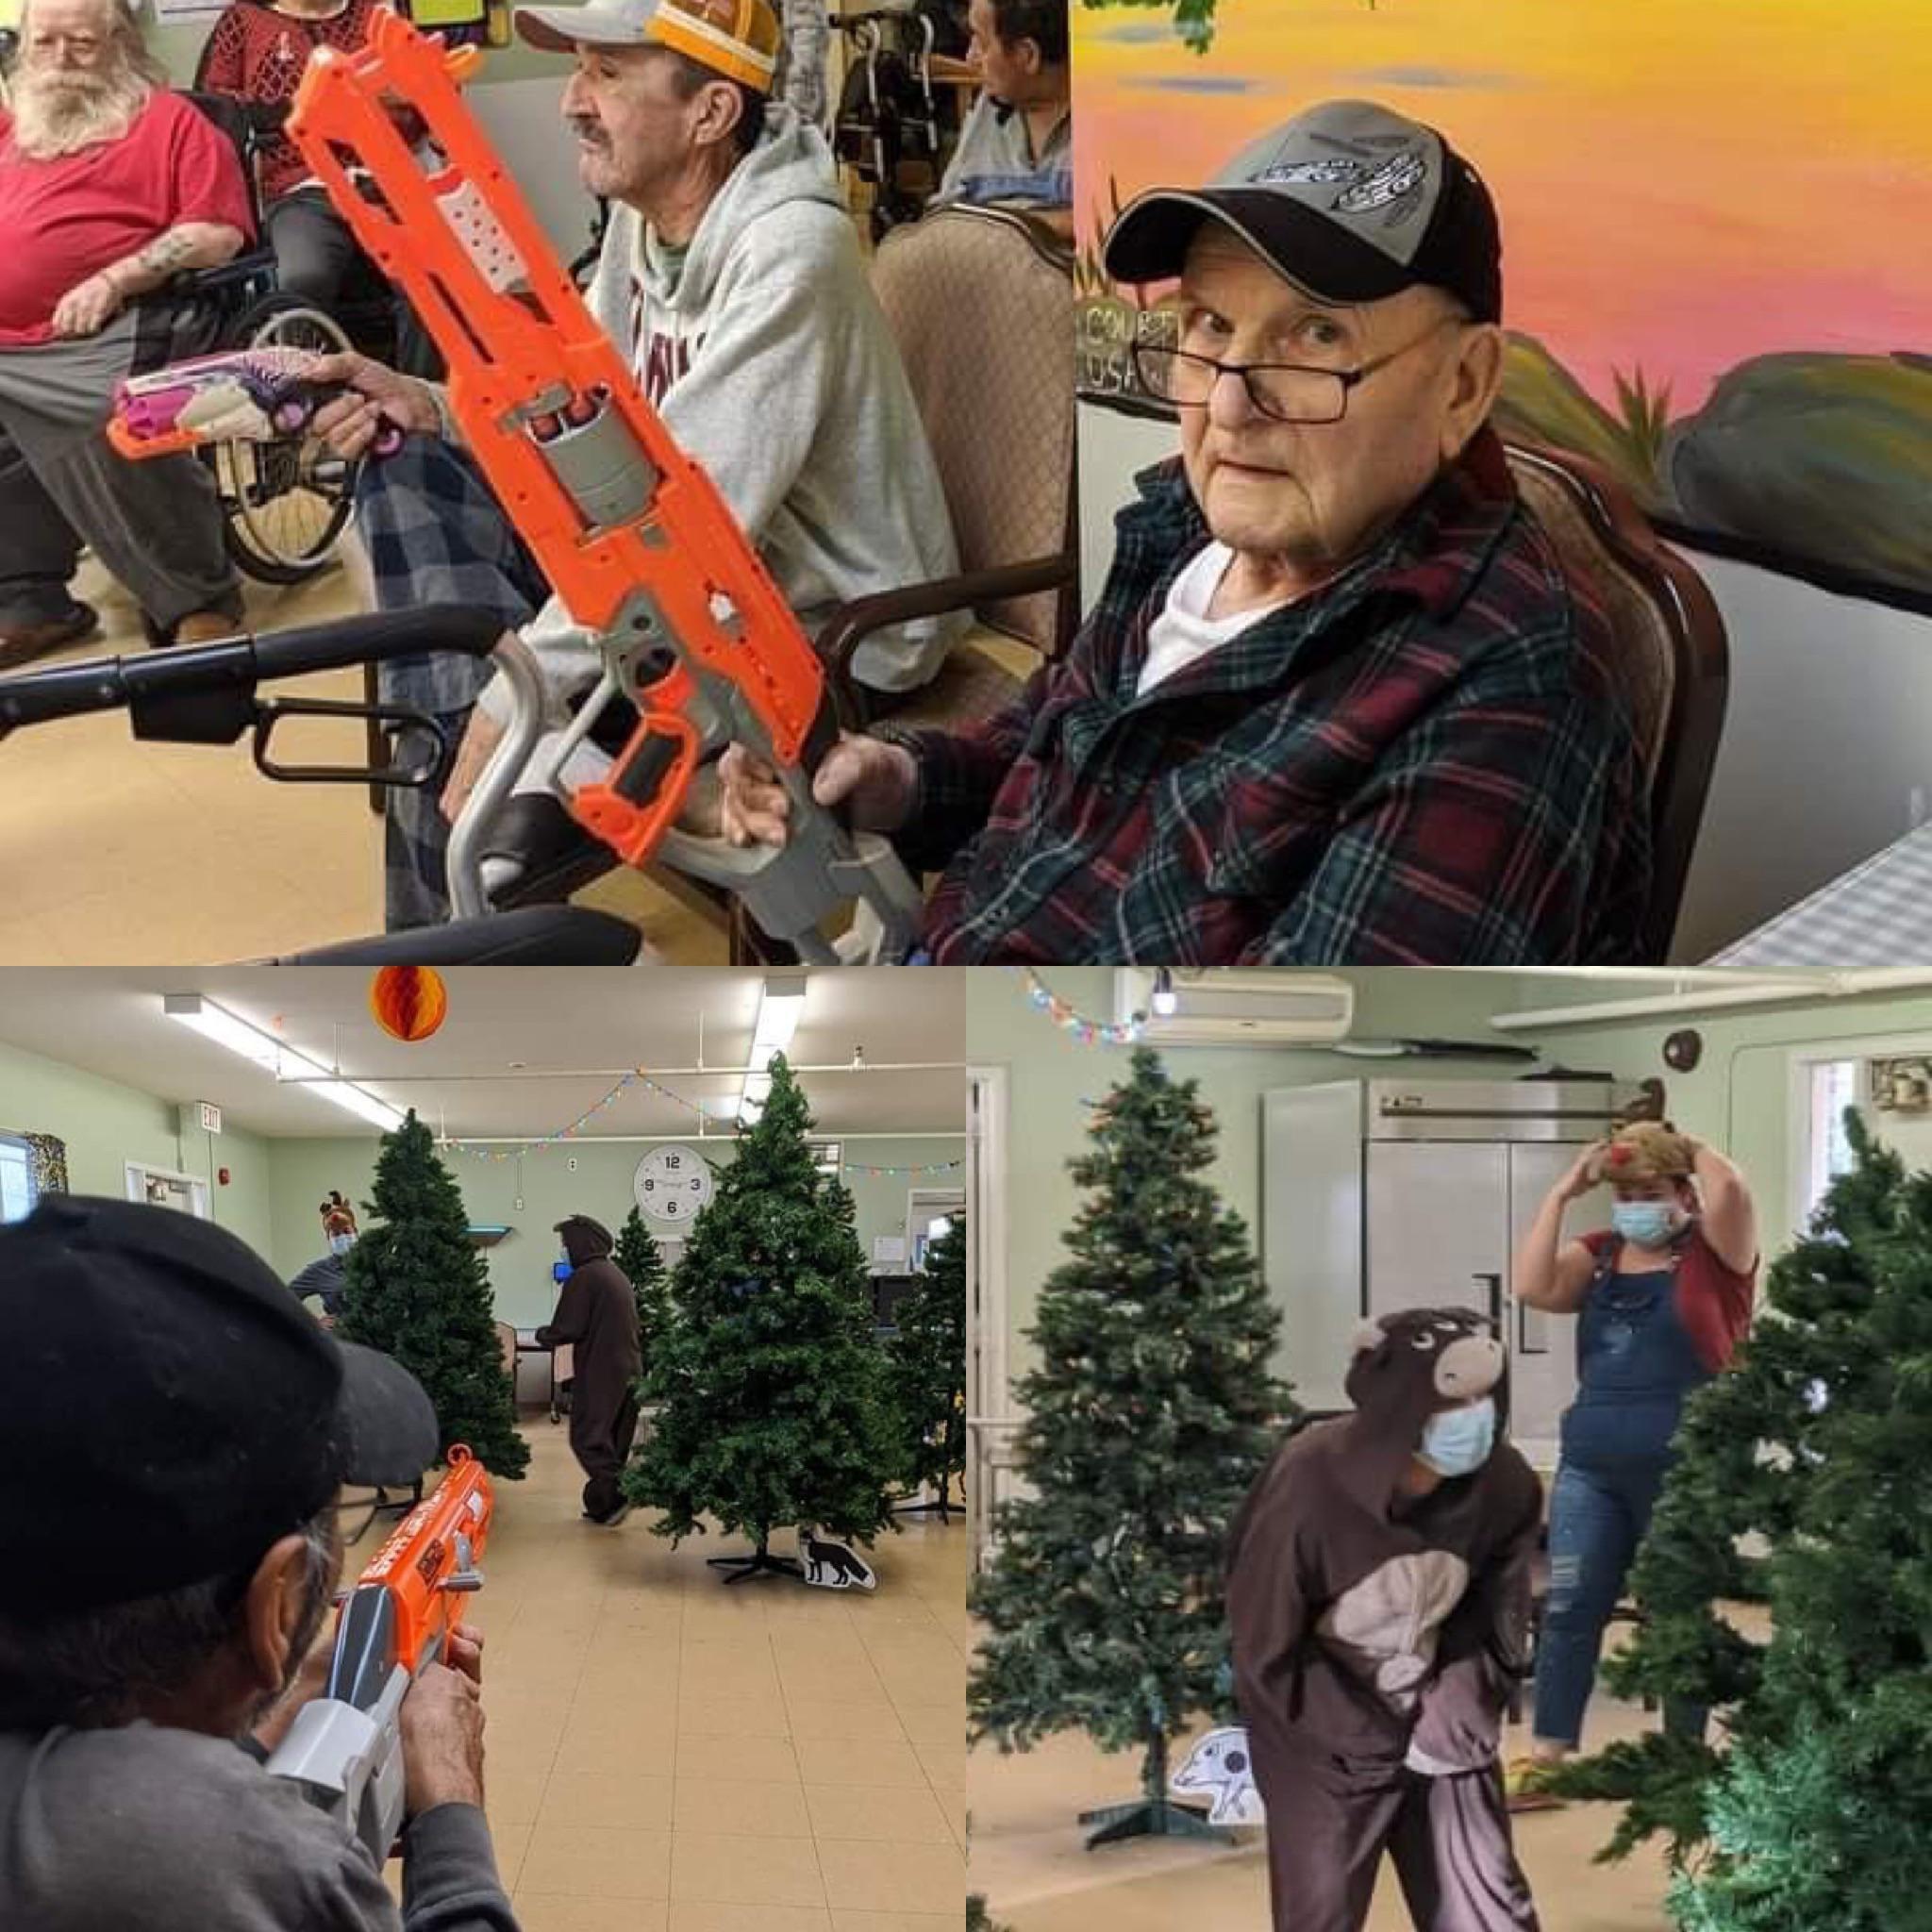 Doe! It's deer huntin' season at the nursing home!